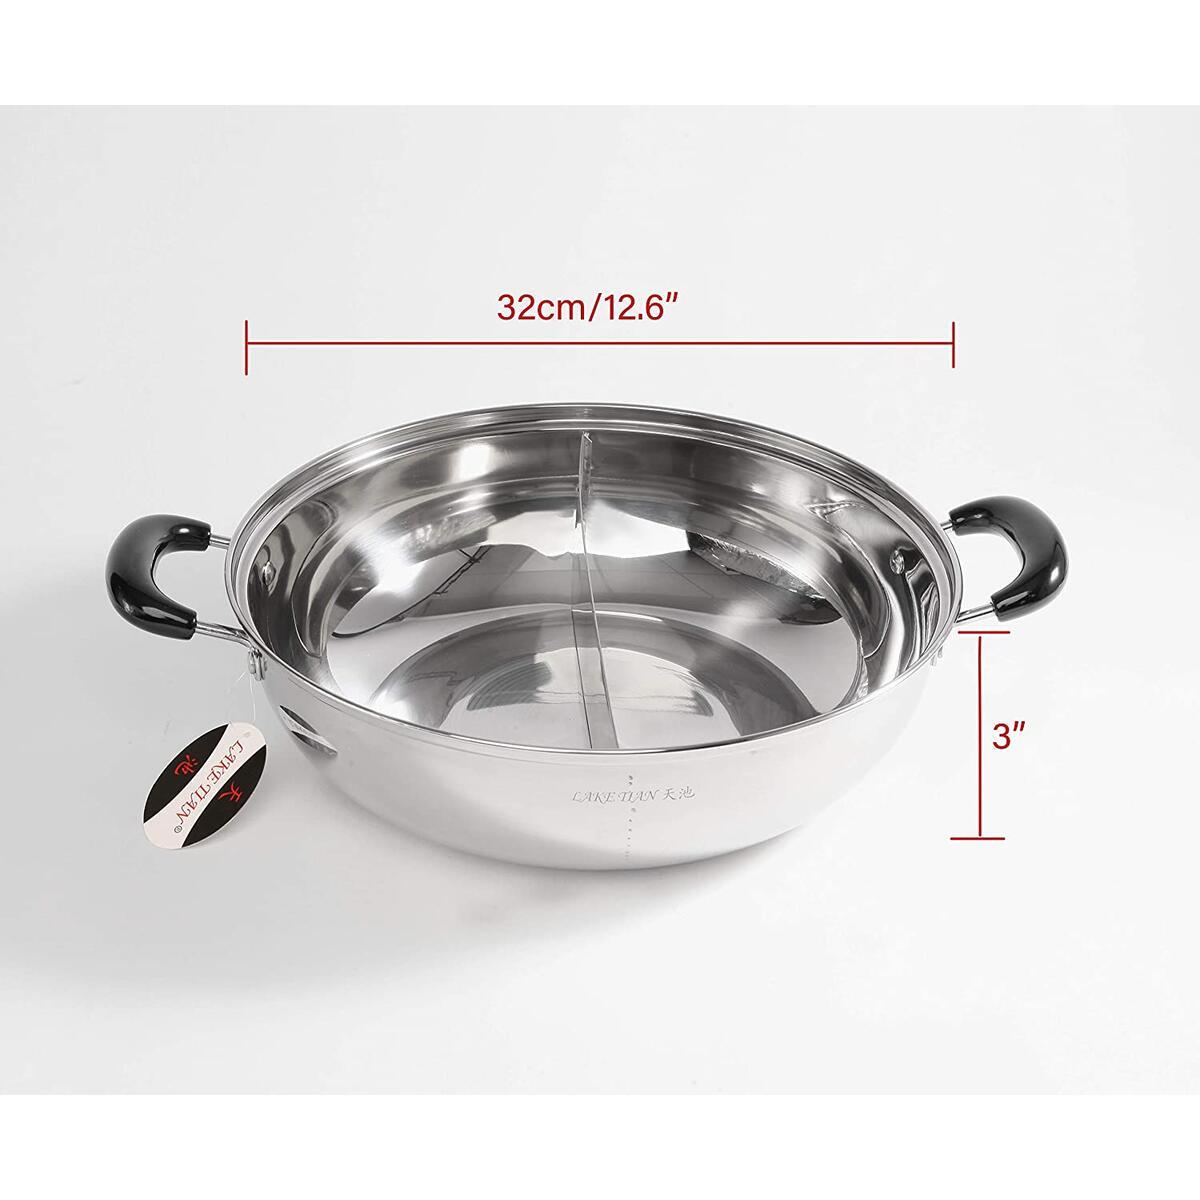 Stainless Steel Shabu Shabu Hot Pot 32CM